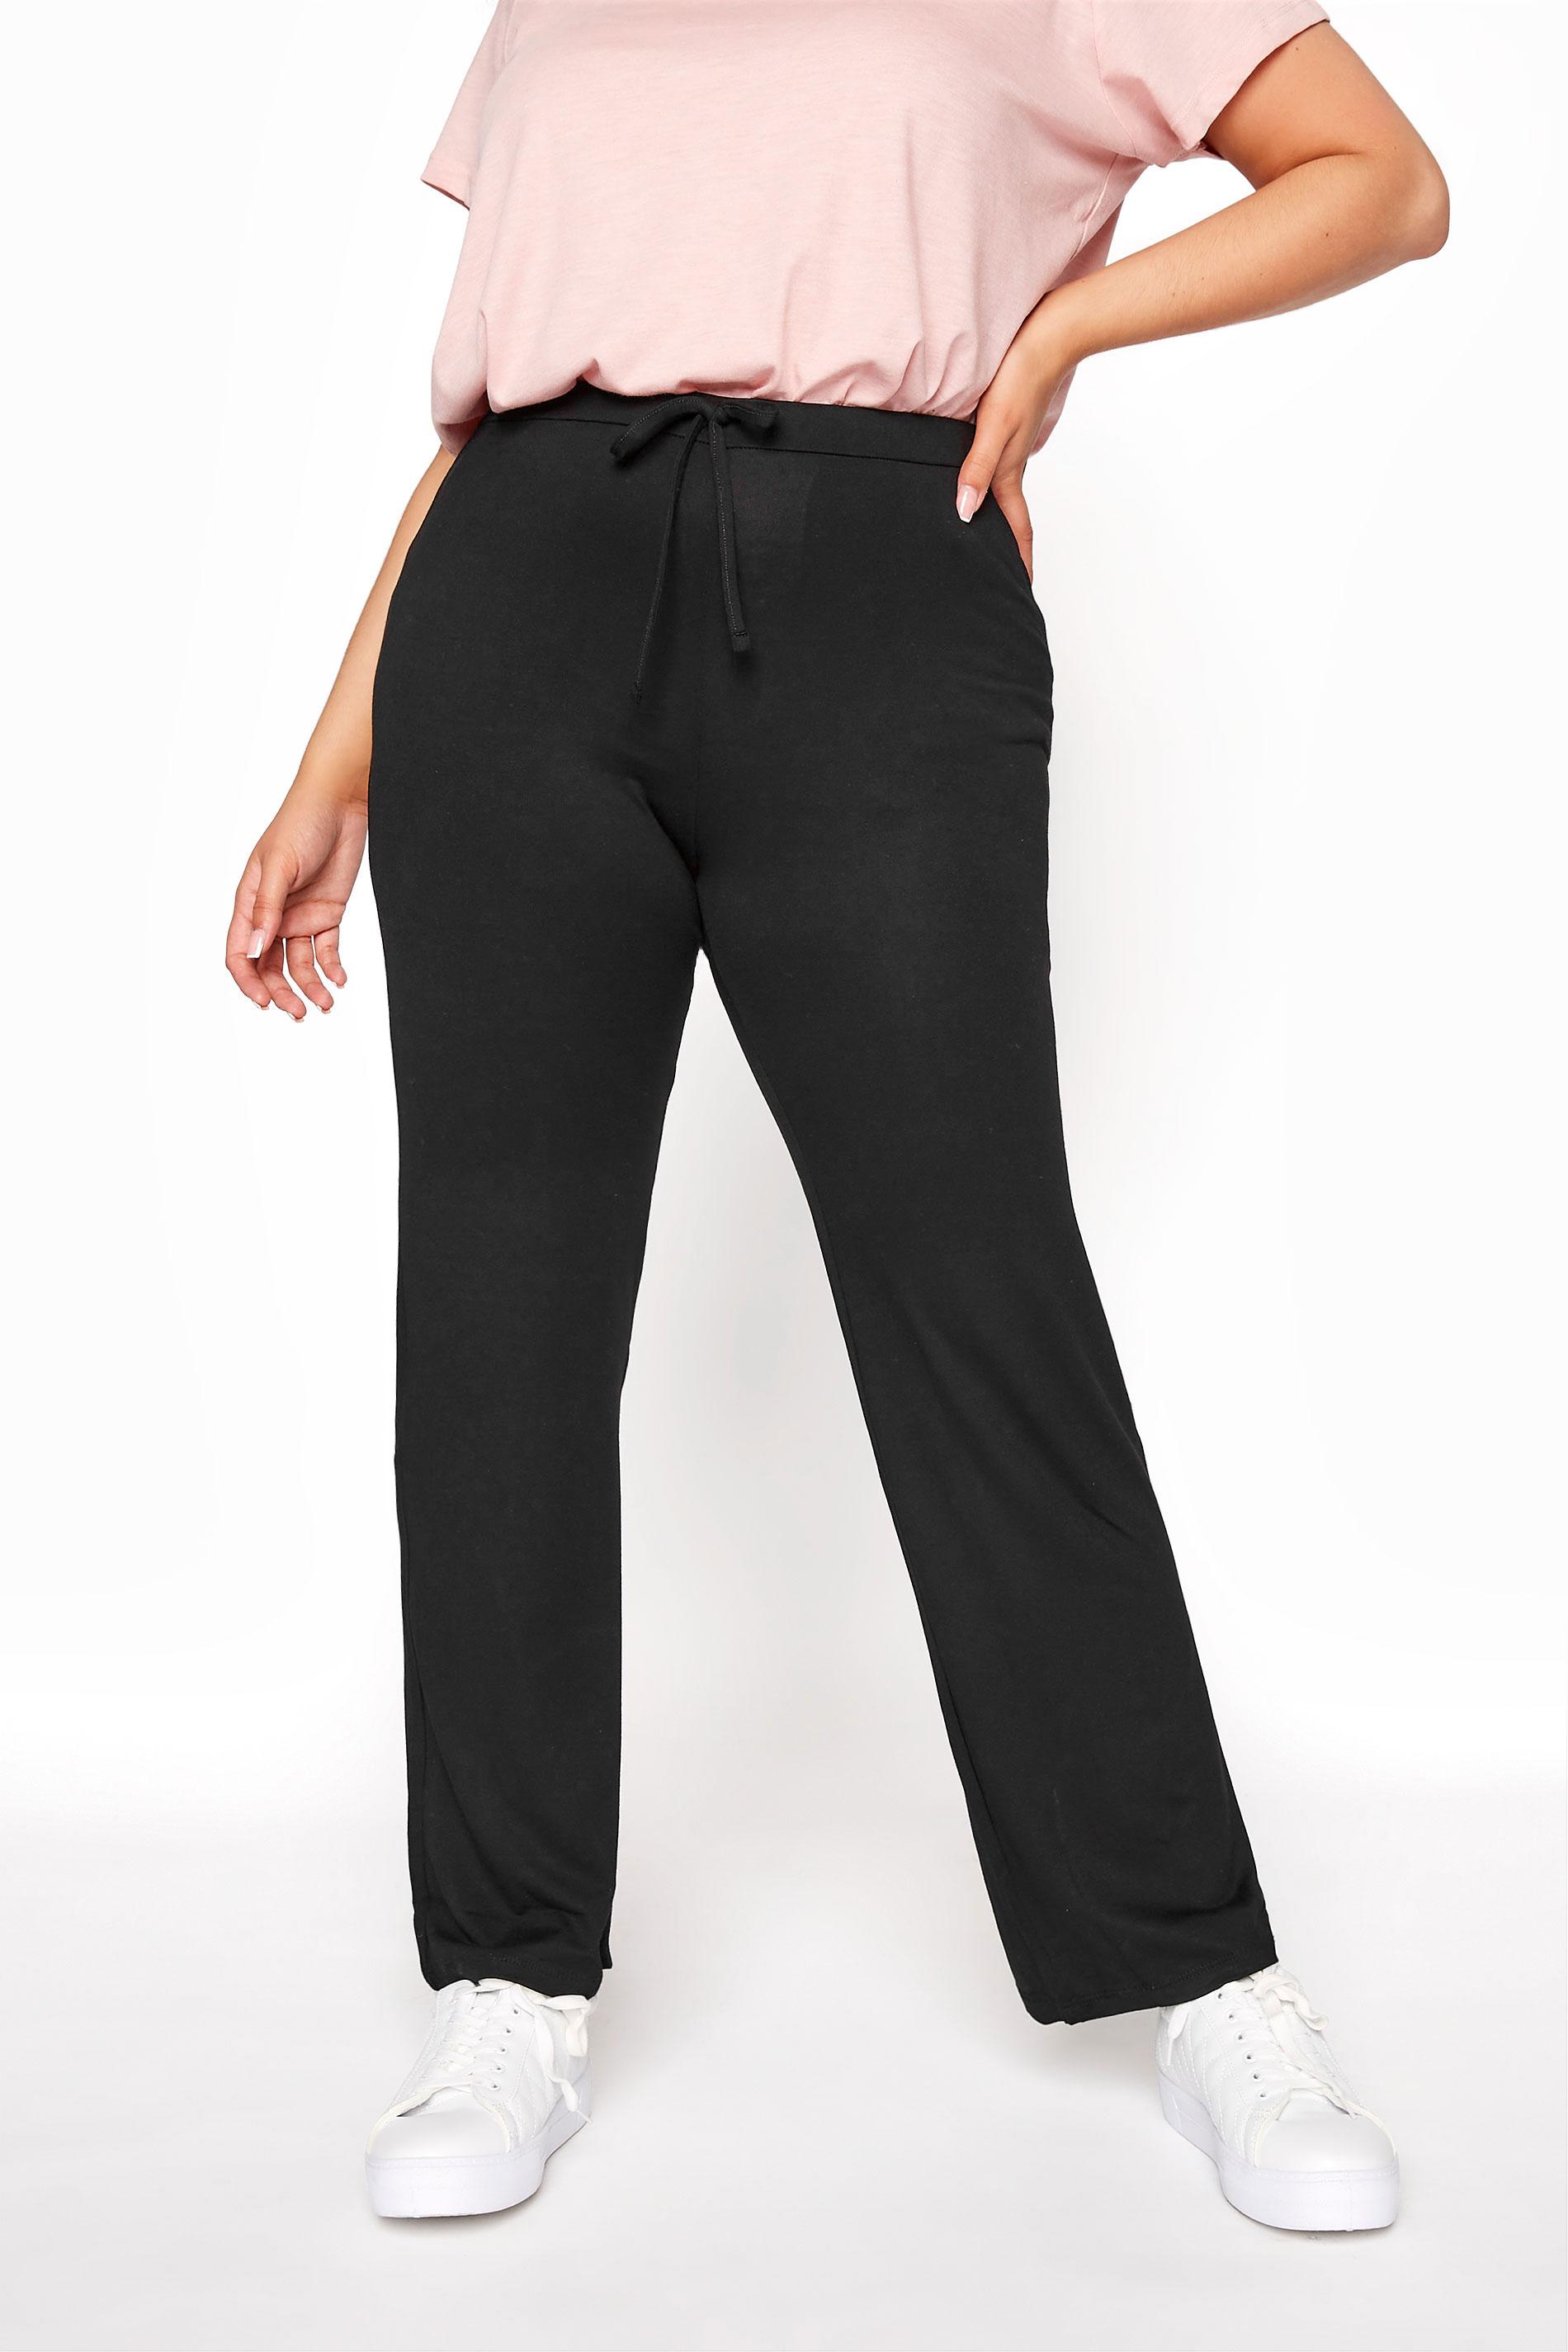 BESTSELLER Black Wide Leg Pull On Stretch Jersey Yoga Pants_B.jpg